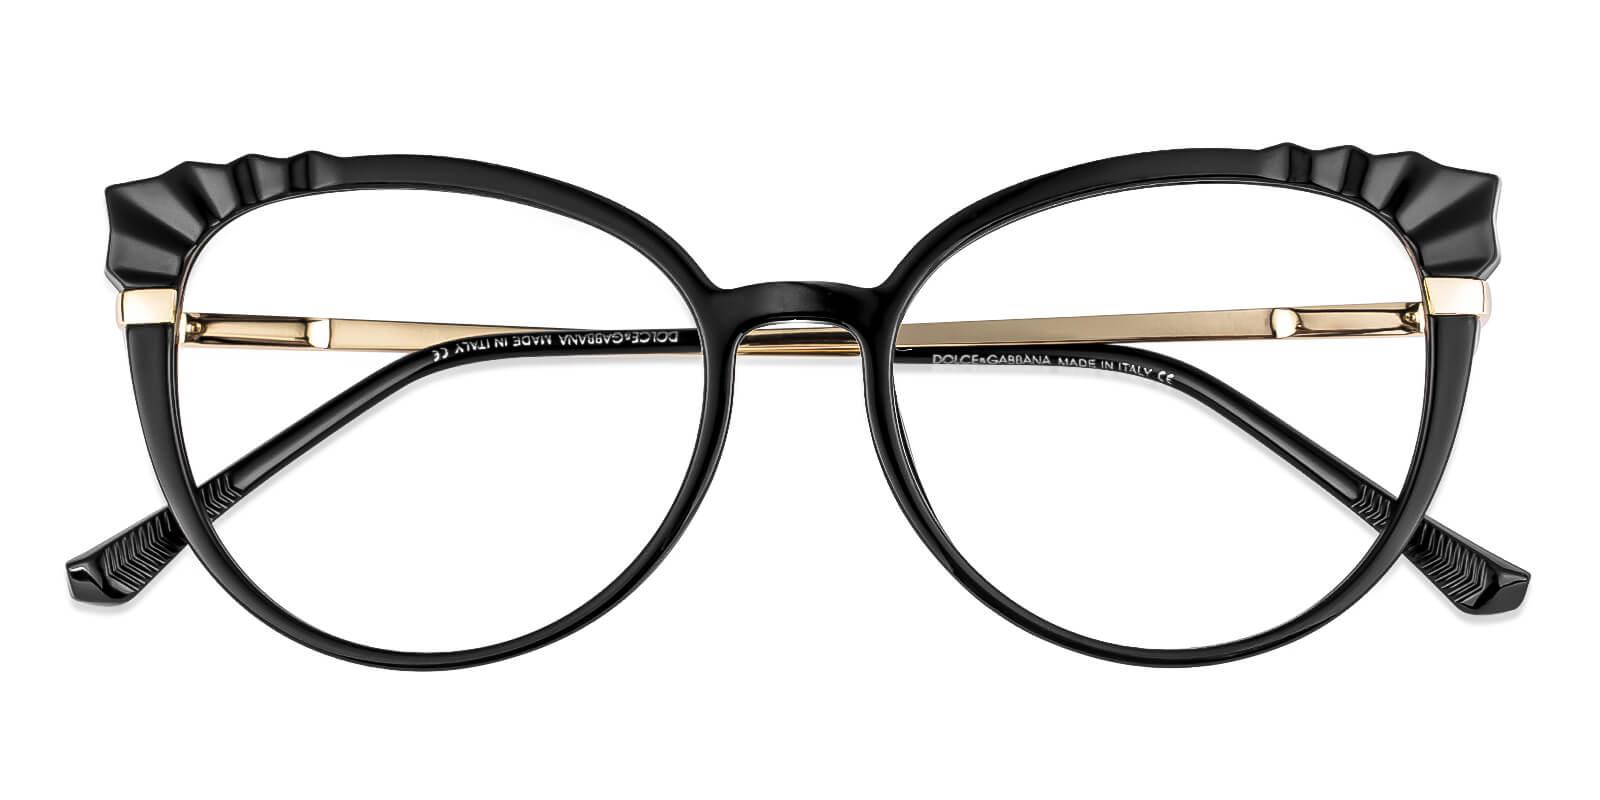 Iconic Black Combination Eyeglasses , Fashion , SpringHinges , UniversalBridgeFit Frames from ABBE Glasses